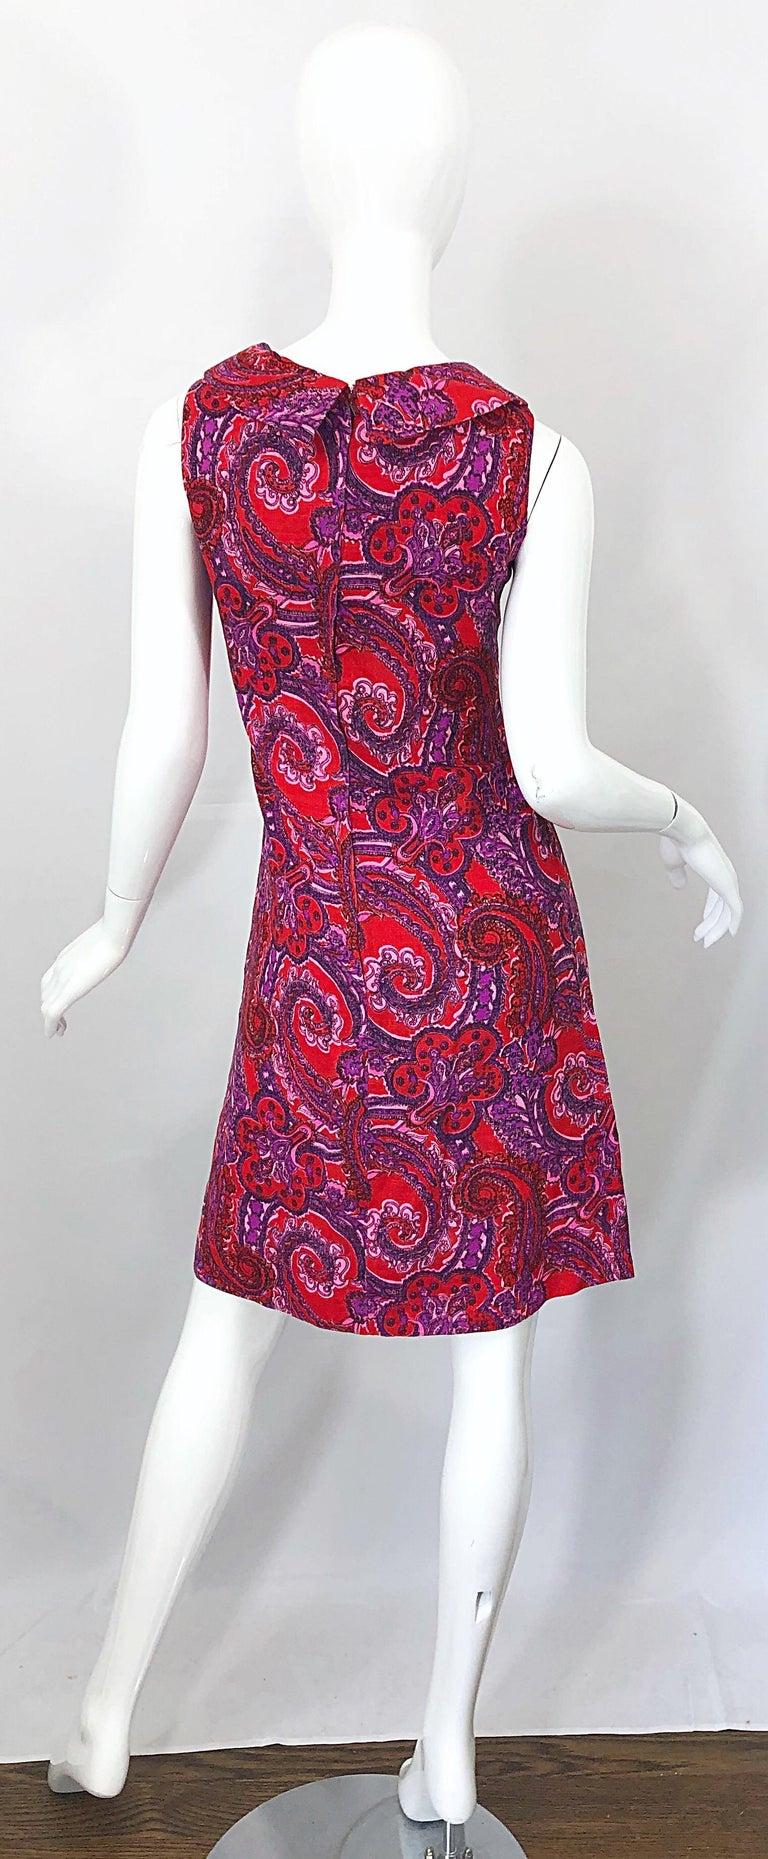 Women's Chic 1960s Irish Linen Pink + Red + Purple Paisley Vintage 60s Mod Shift Dress For Sale